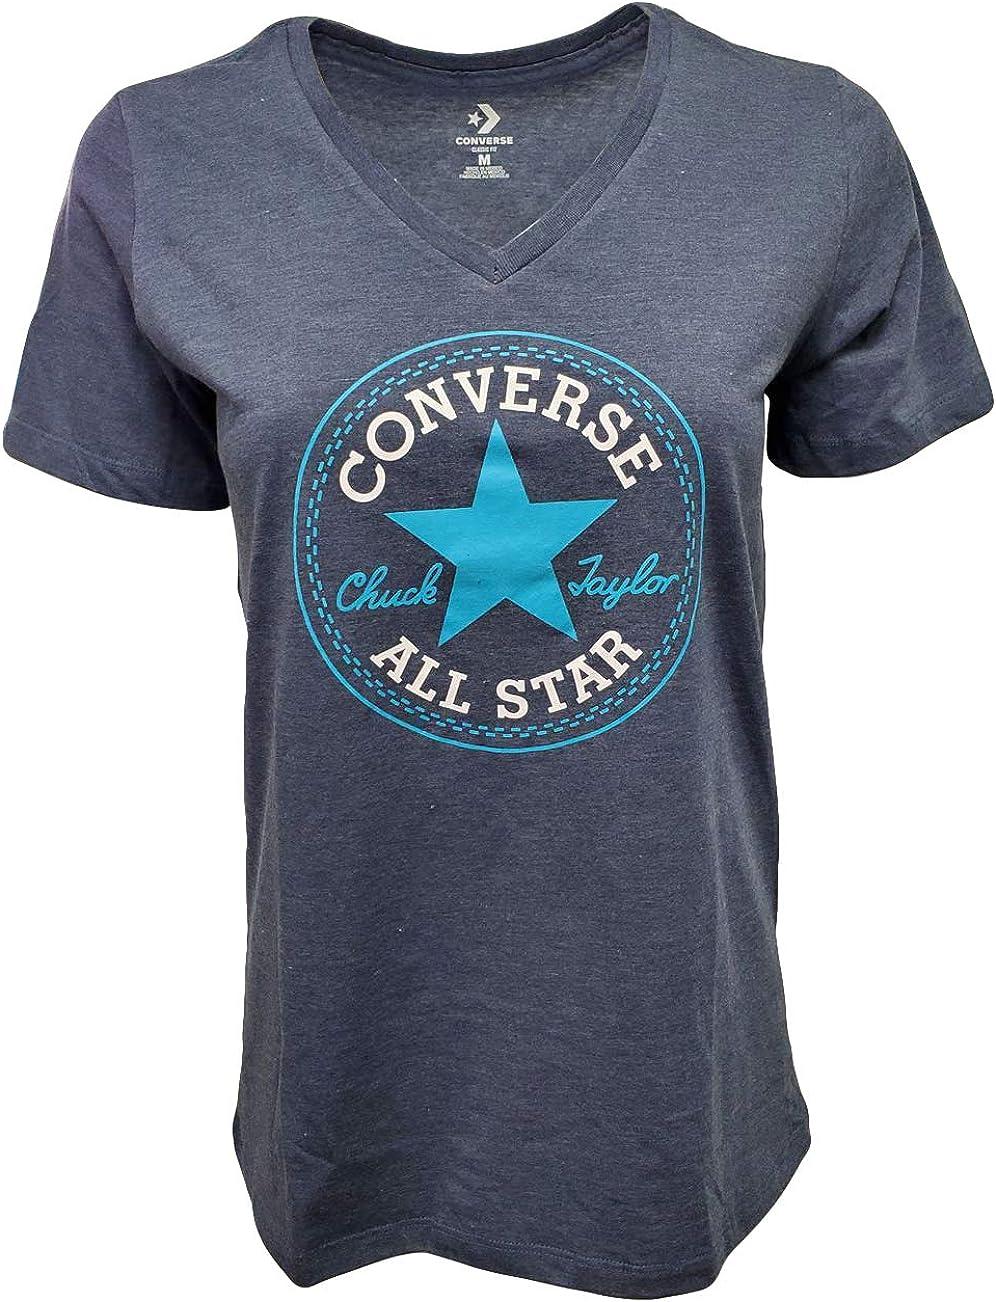 Converse Women's Chuck Taylor Core Patch V-Neck T-Shirt Blue